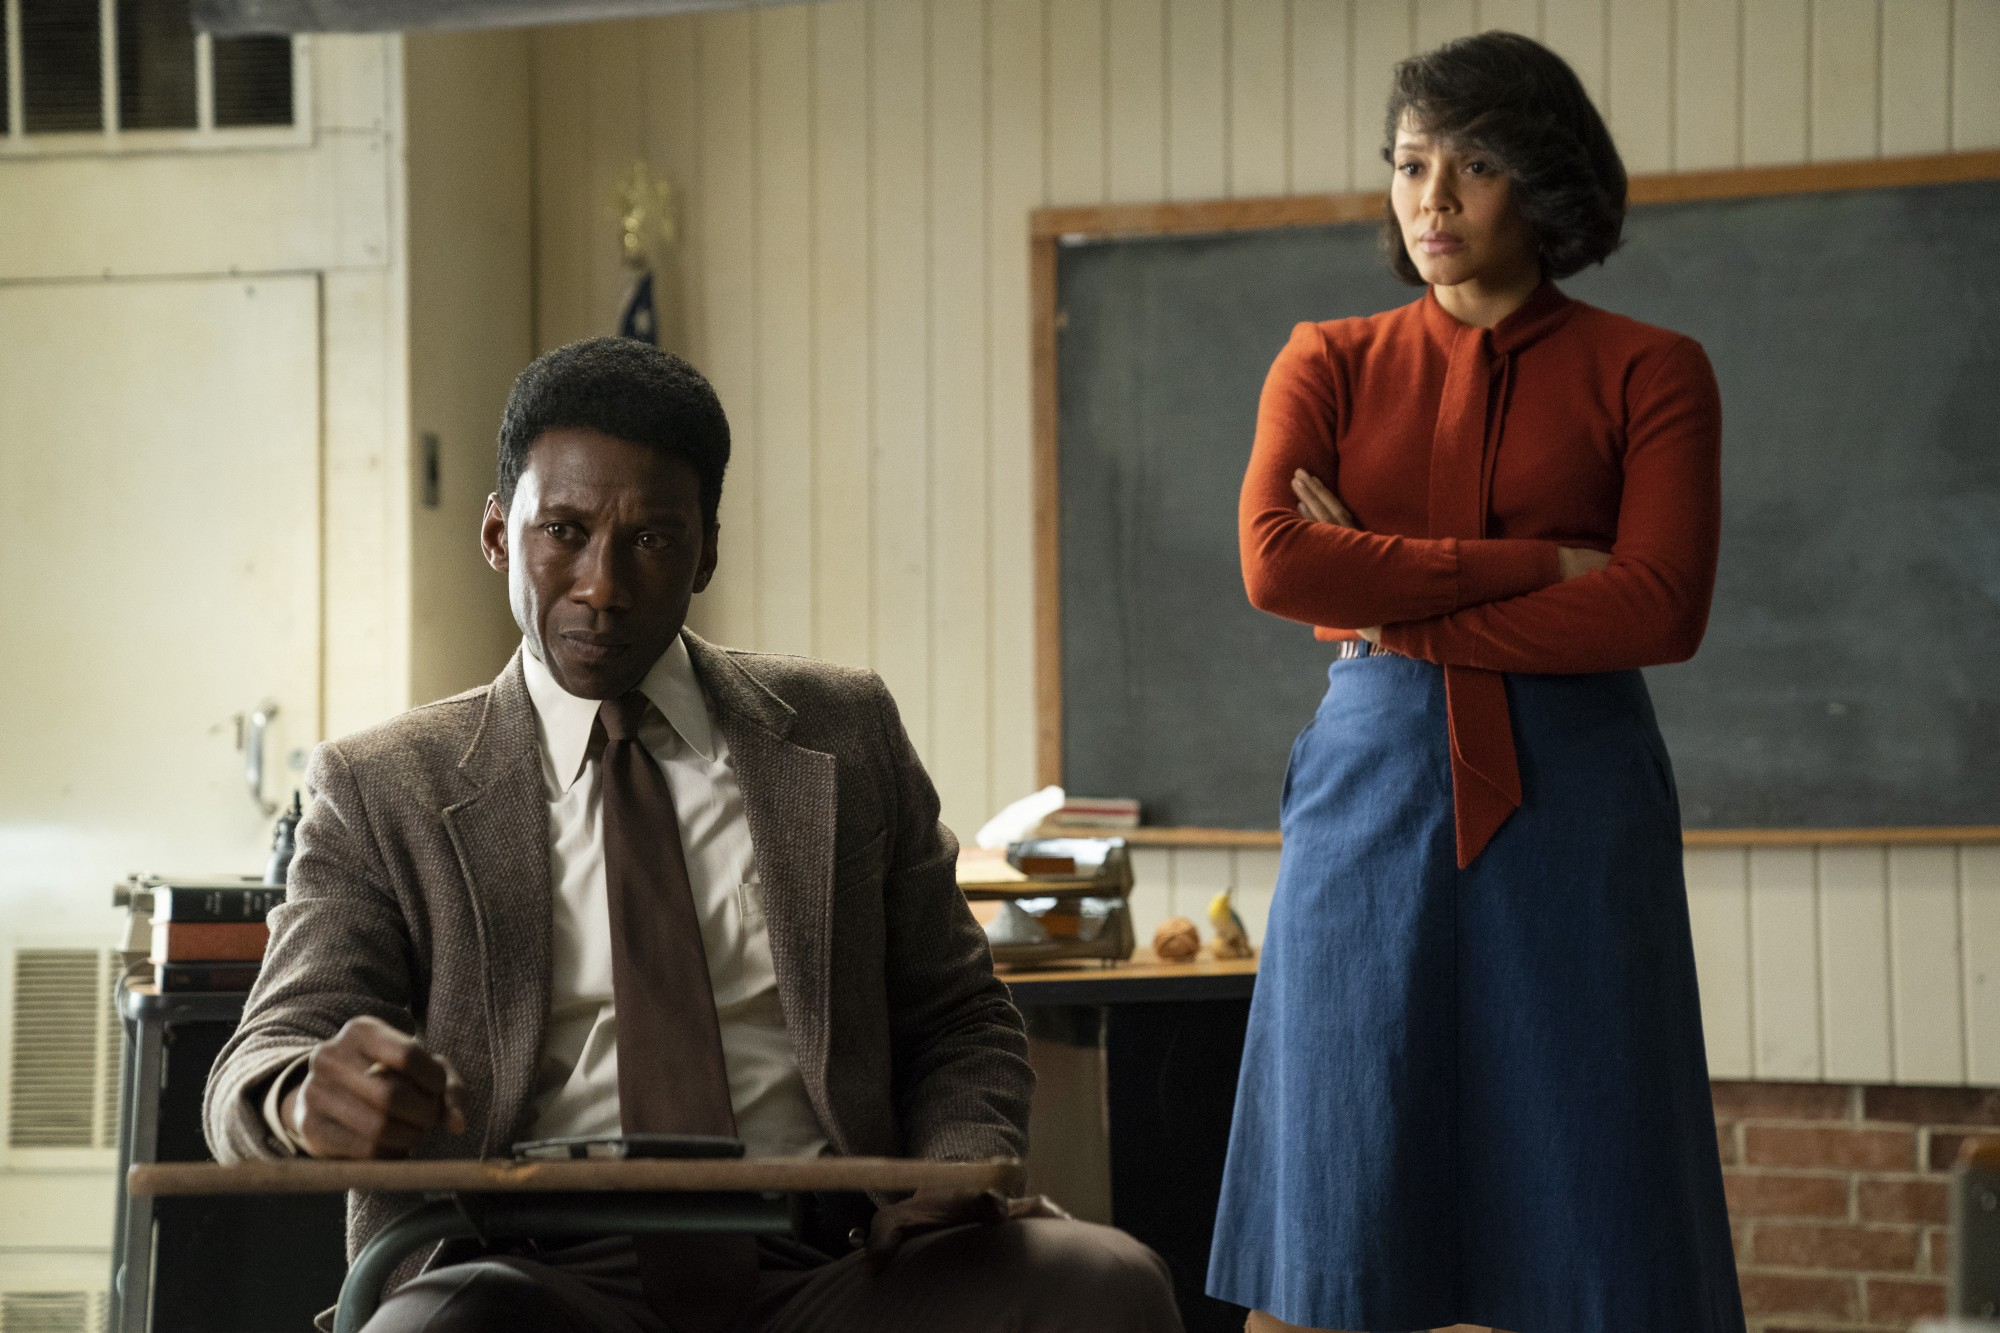 'True Detective' Season 3: New Trailer Digs Into the Romance Driving Mahershala Ali